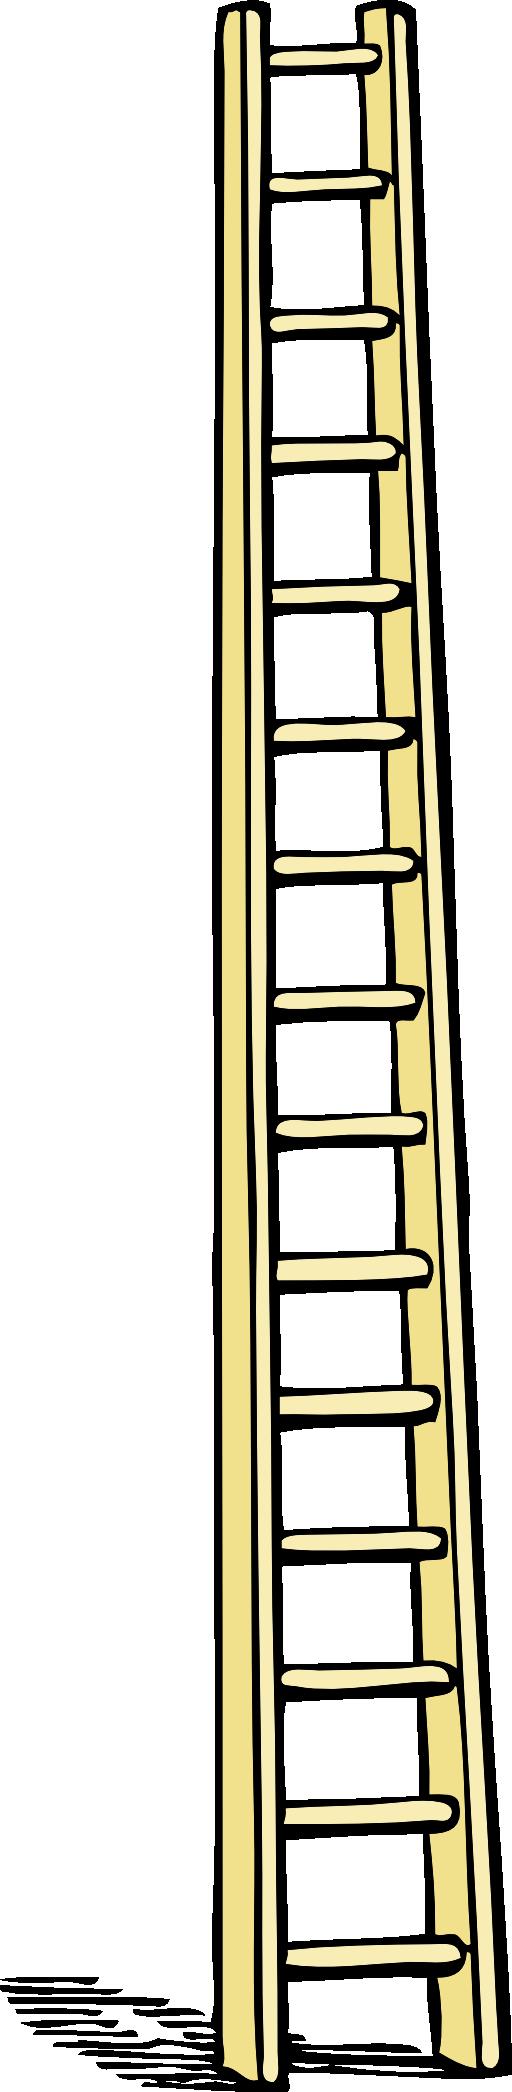 Clipart Tall Ladder 512x512 7d54 Png 512 2092 Ladder Tools Tall Ladder